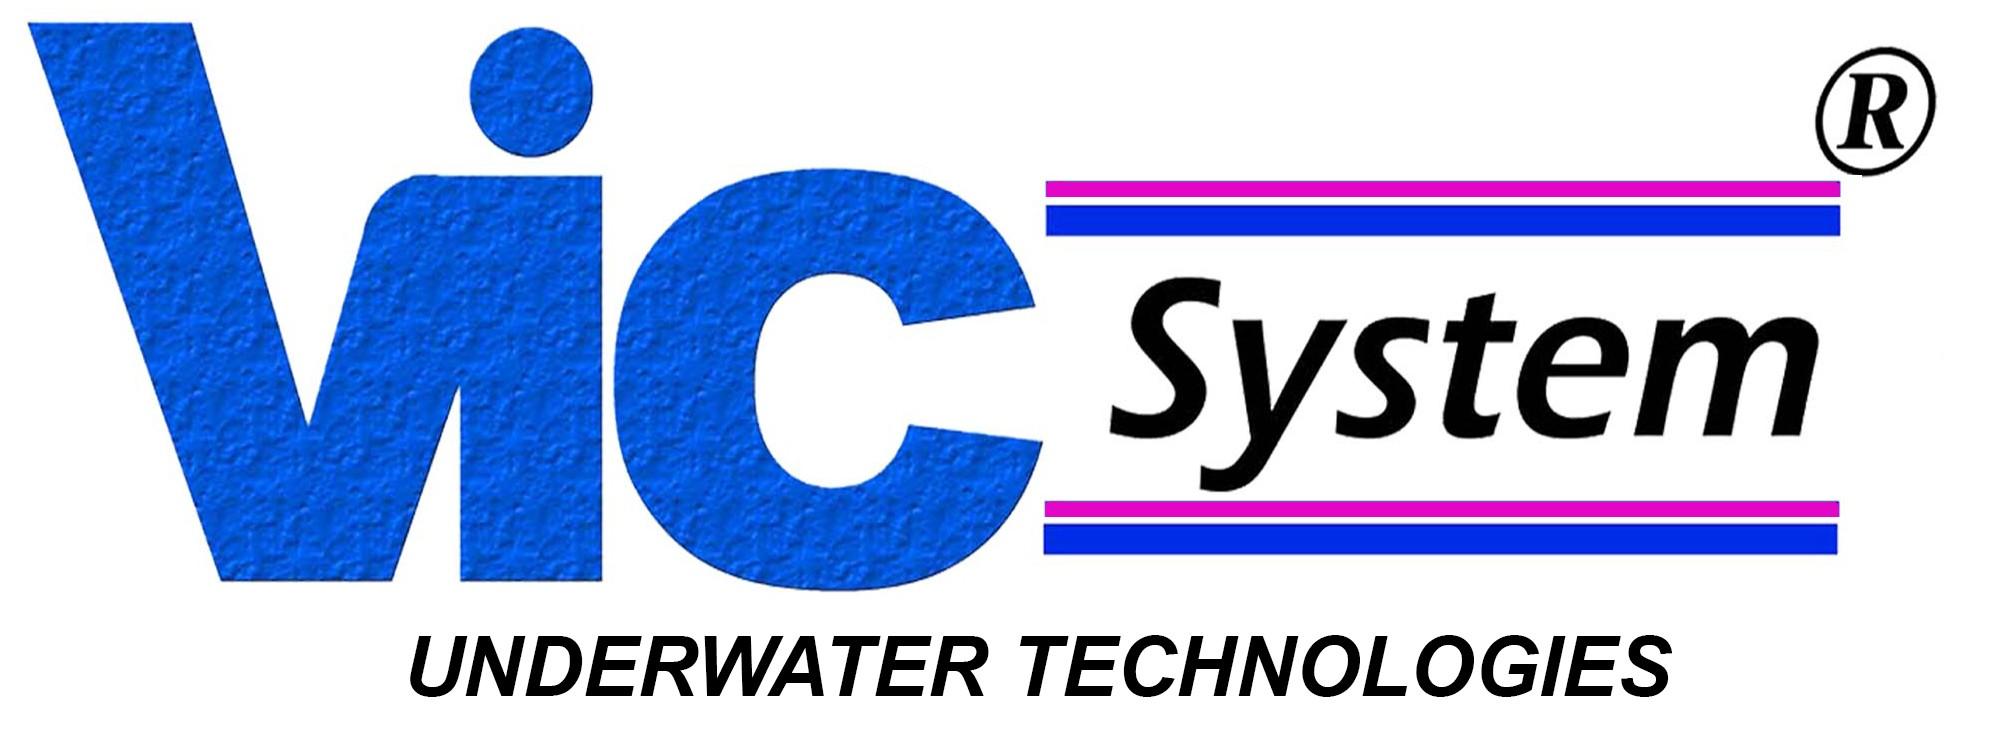 VIC SYSTEM